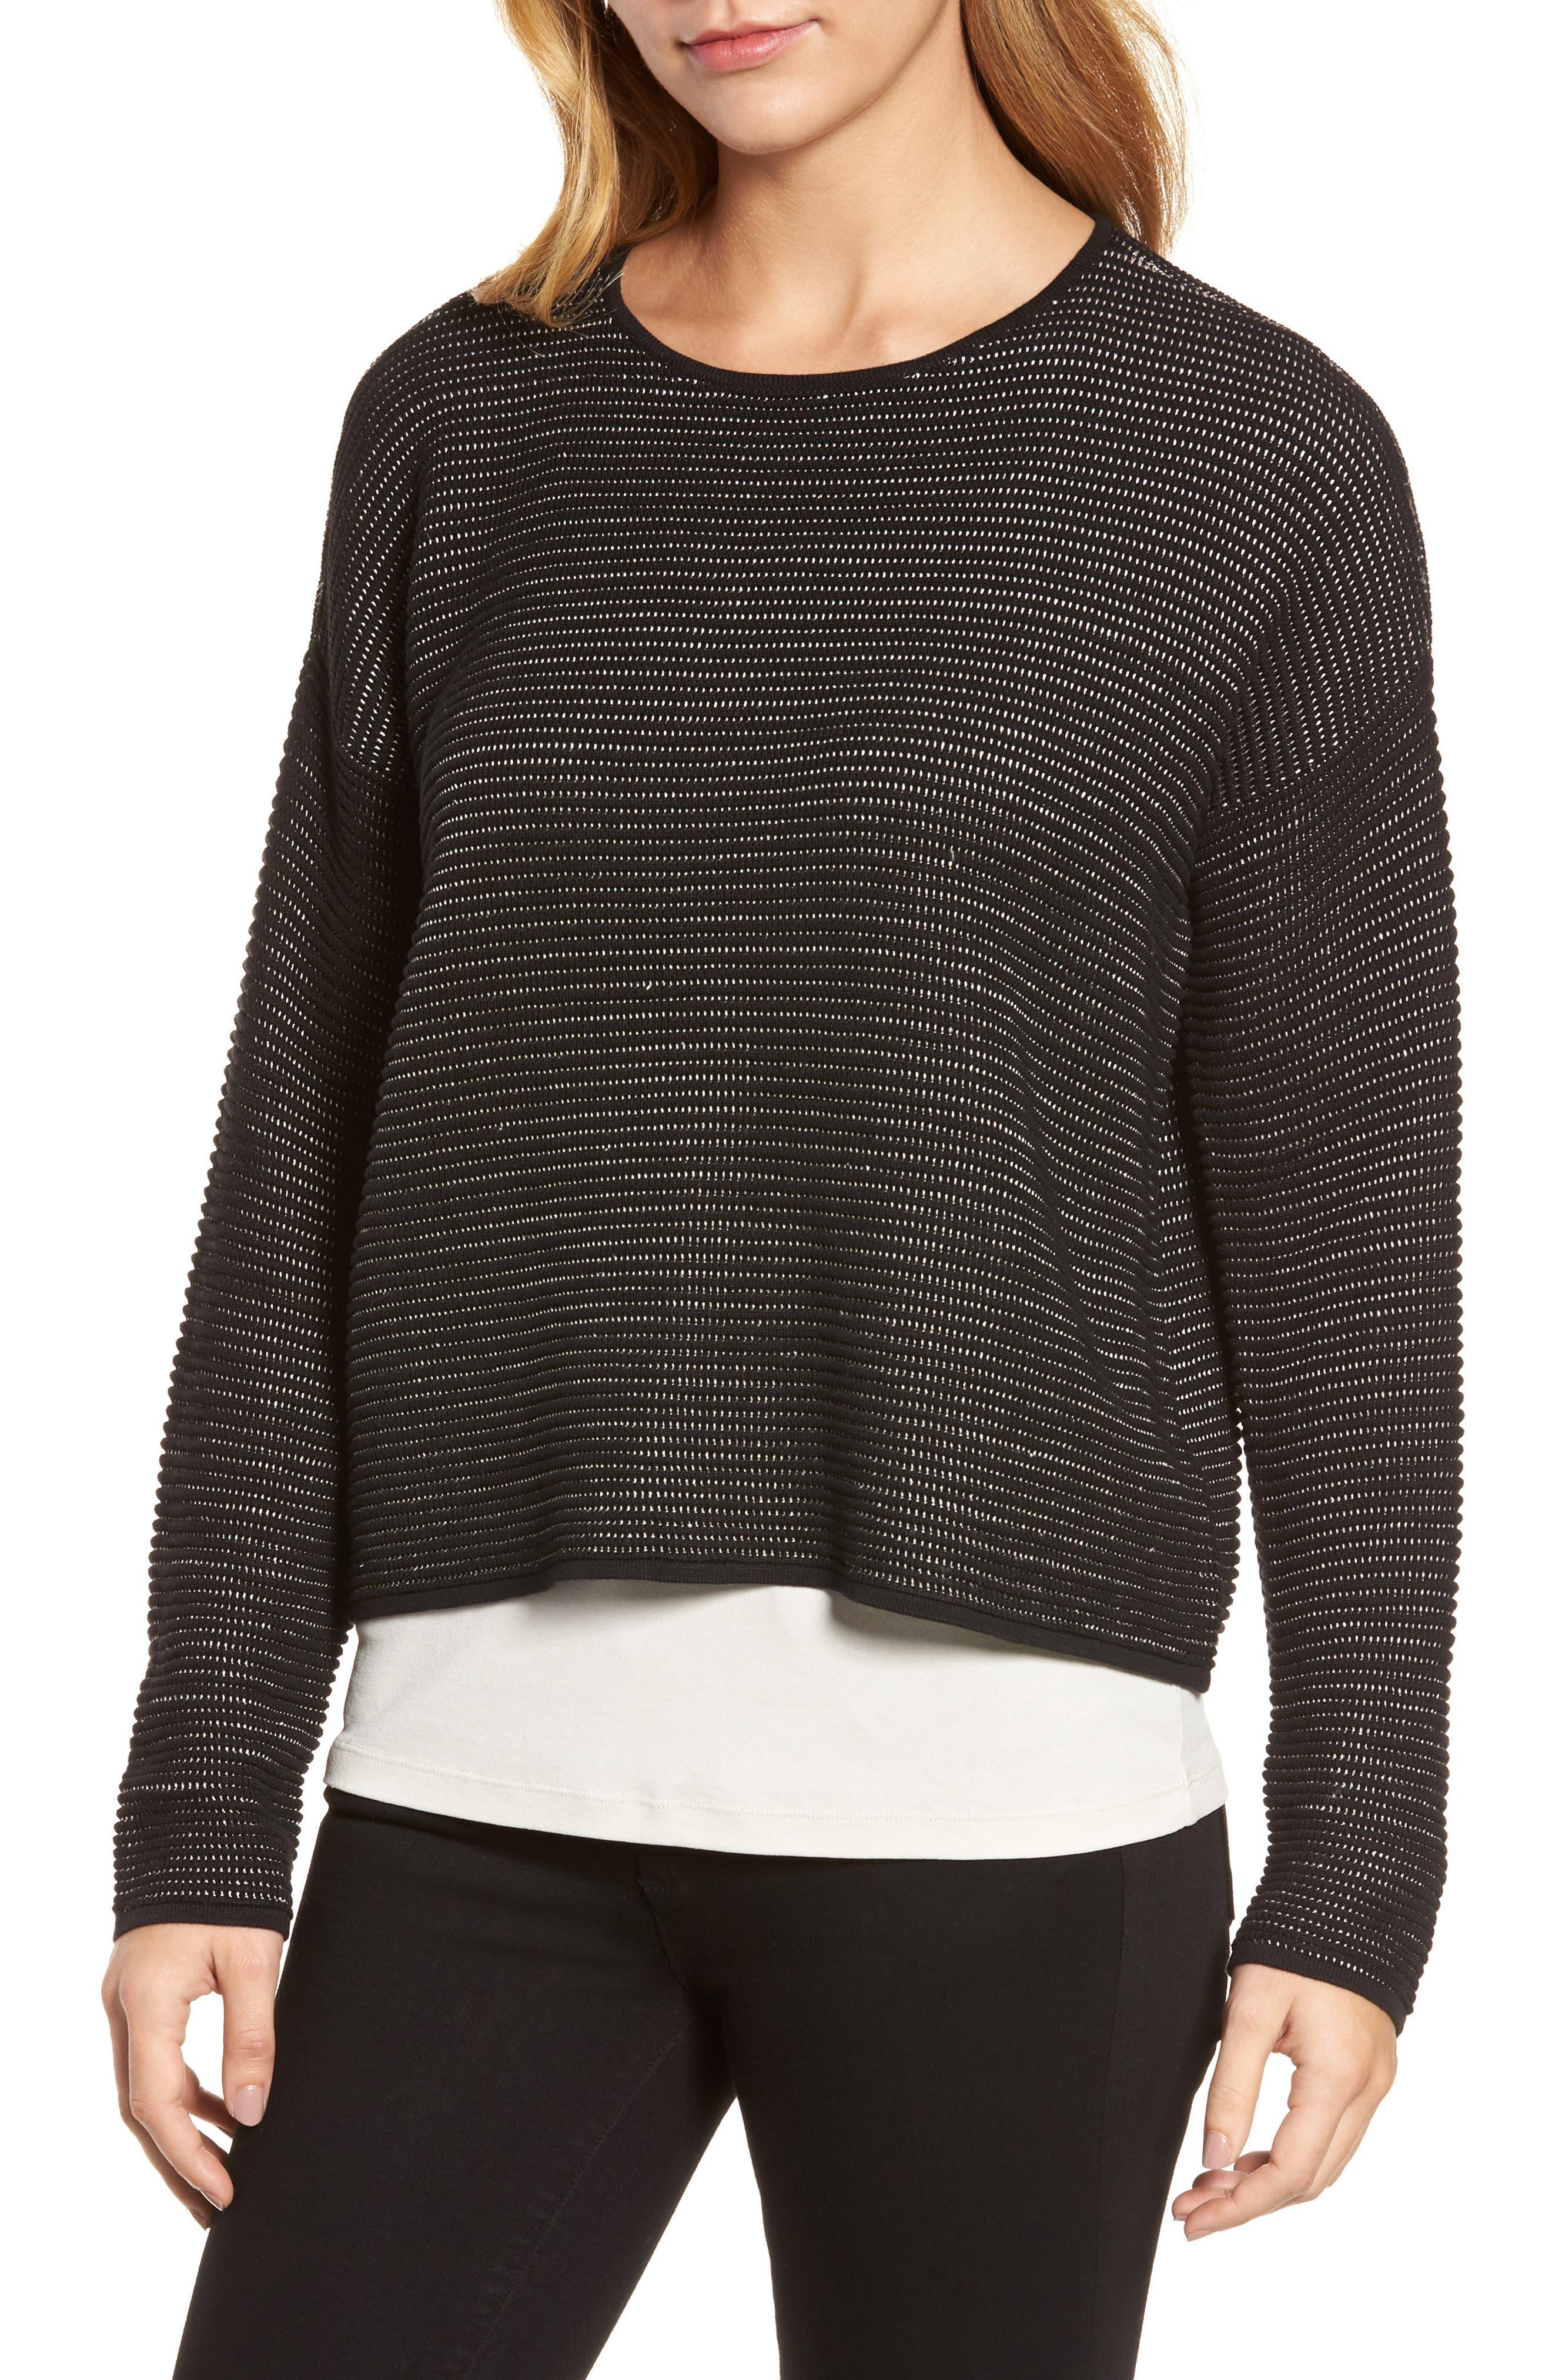 Main Image - Eileen Fisher Boxy Silk Blend Top (Regular & Petite)